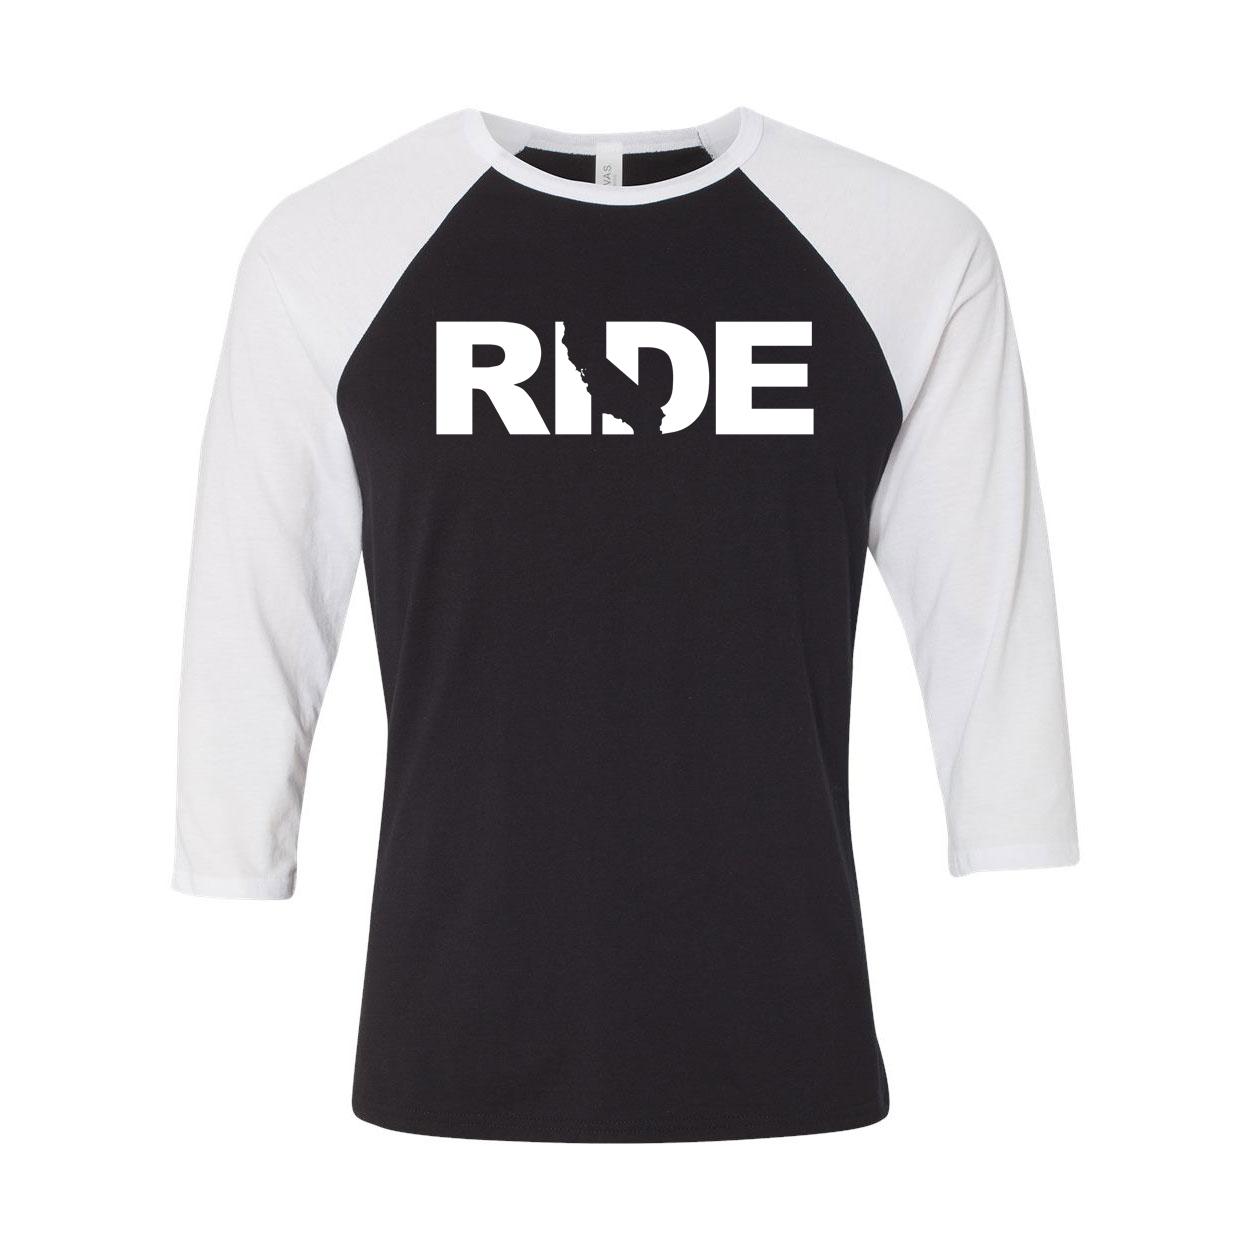 Ride California Classic Raglan Shirt Black/White (White Logo)